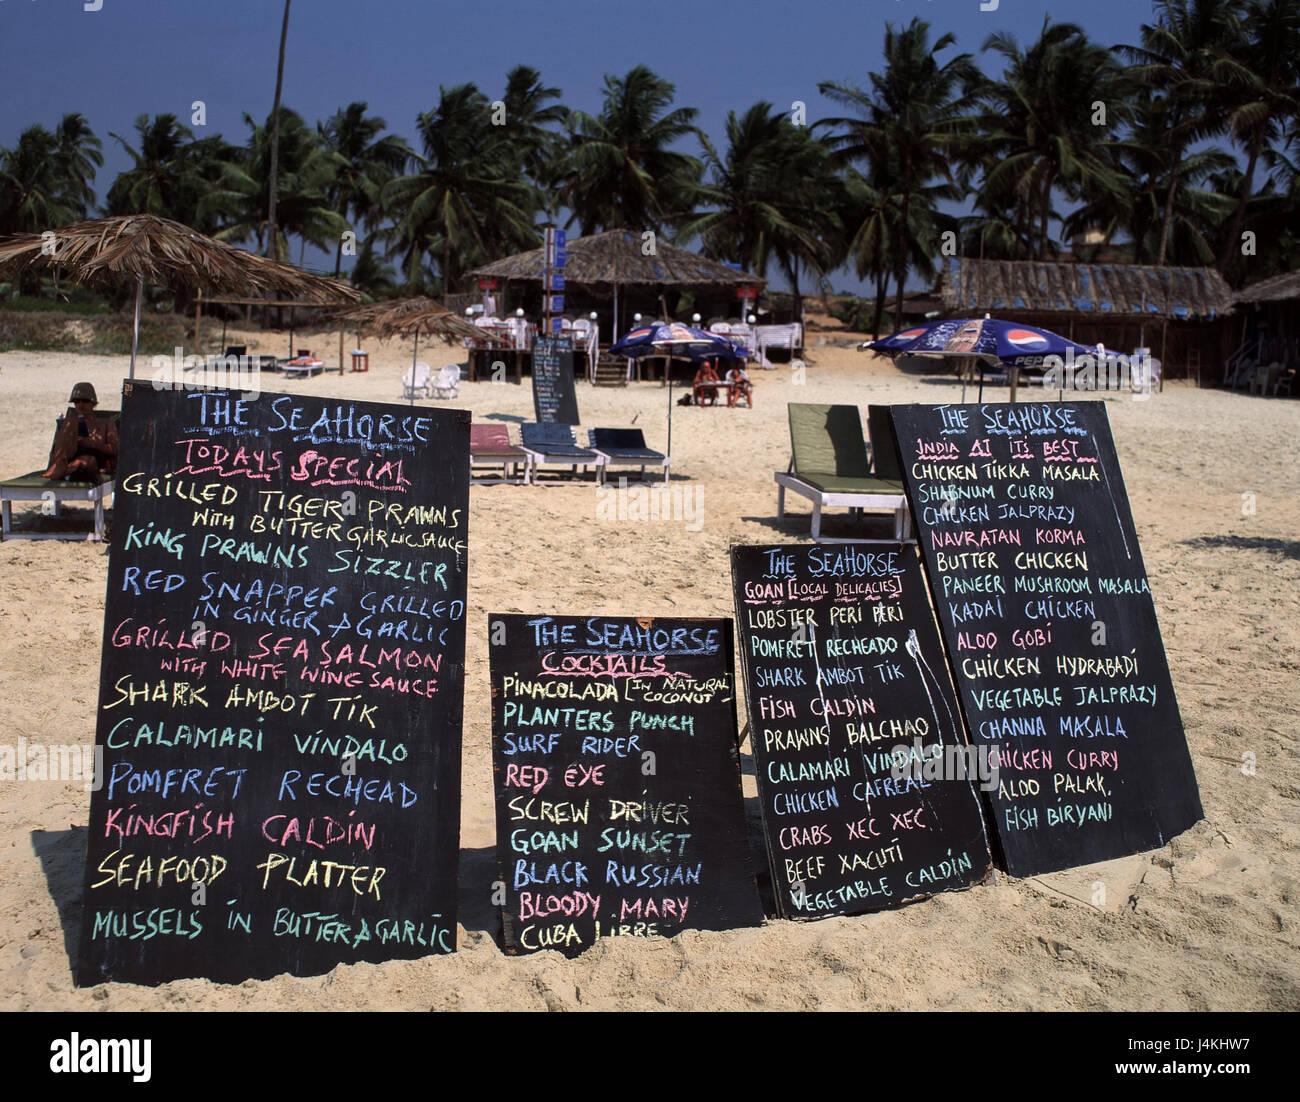 India, Goa, Colva, beach, menus gastronomy, palm beach, menu, drink card - Stock Image